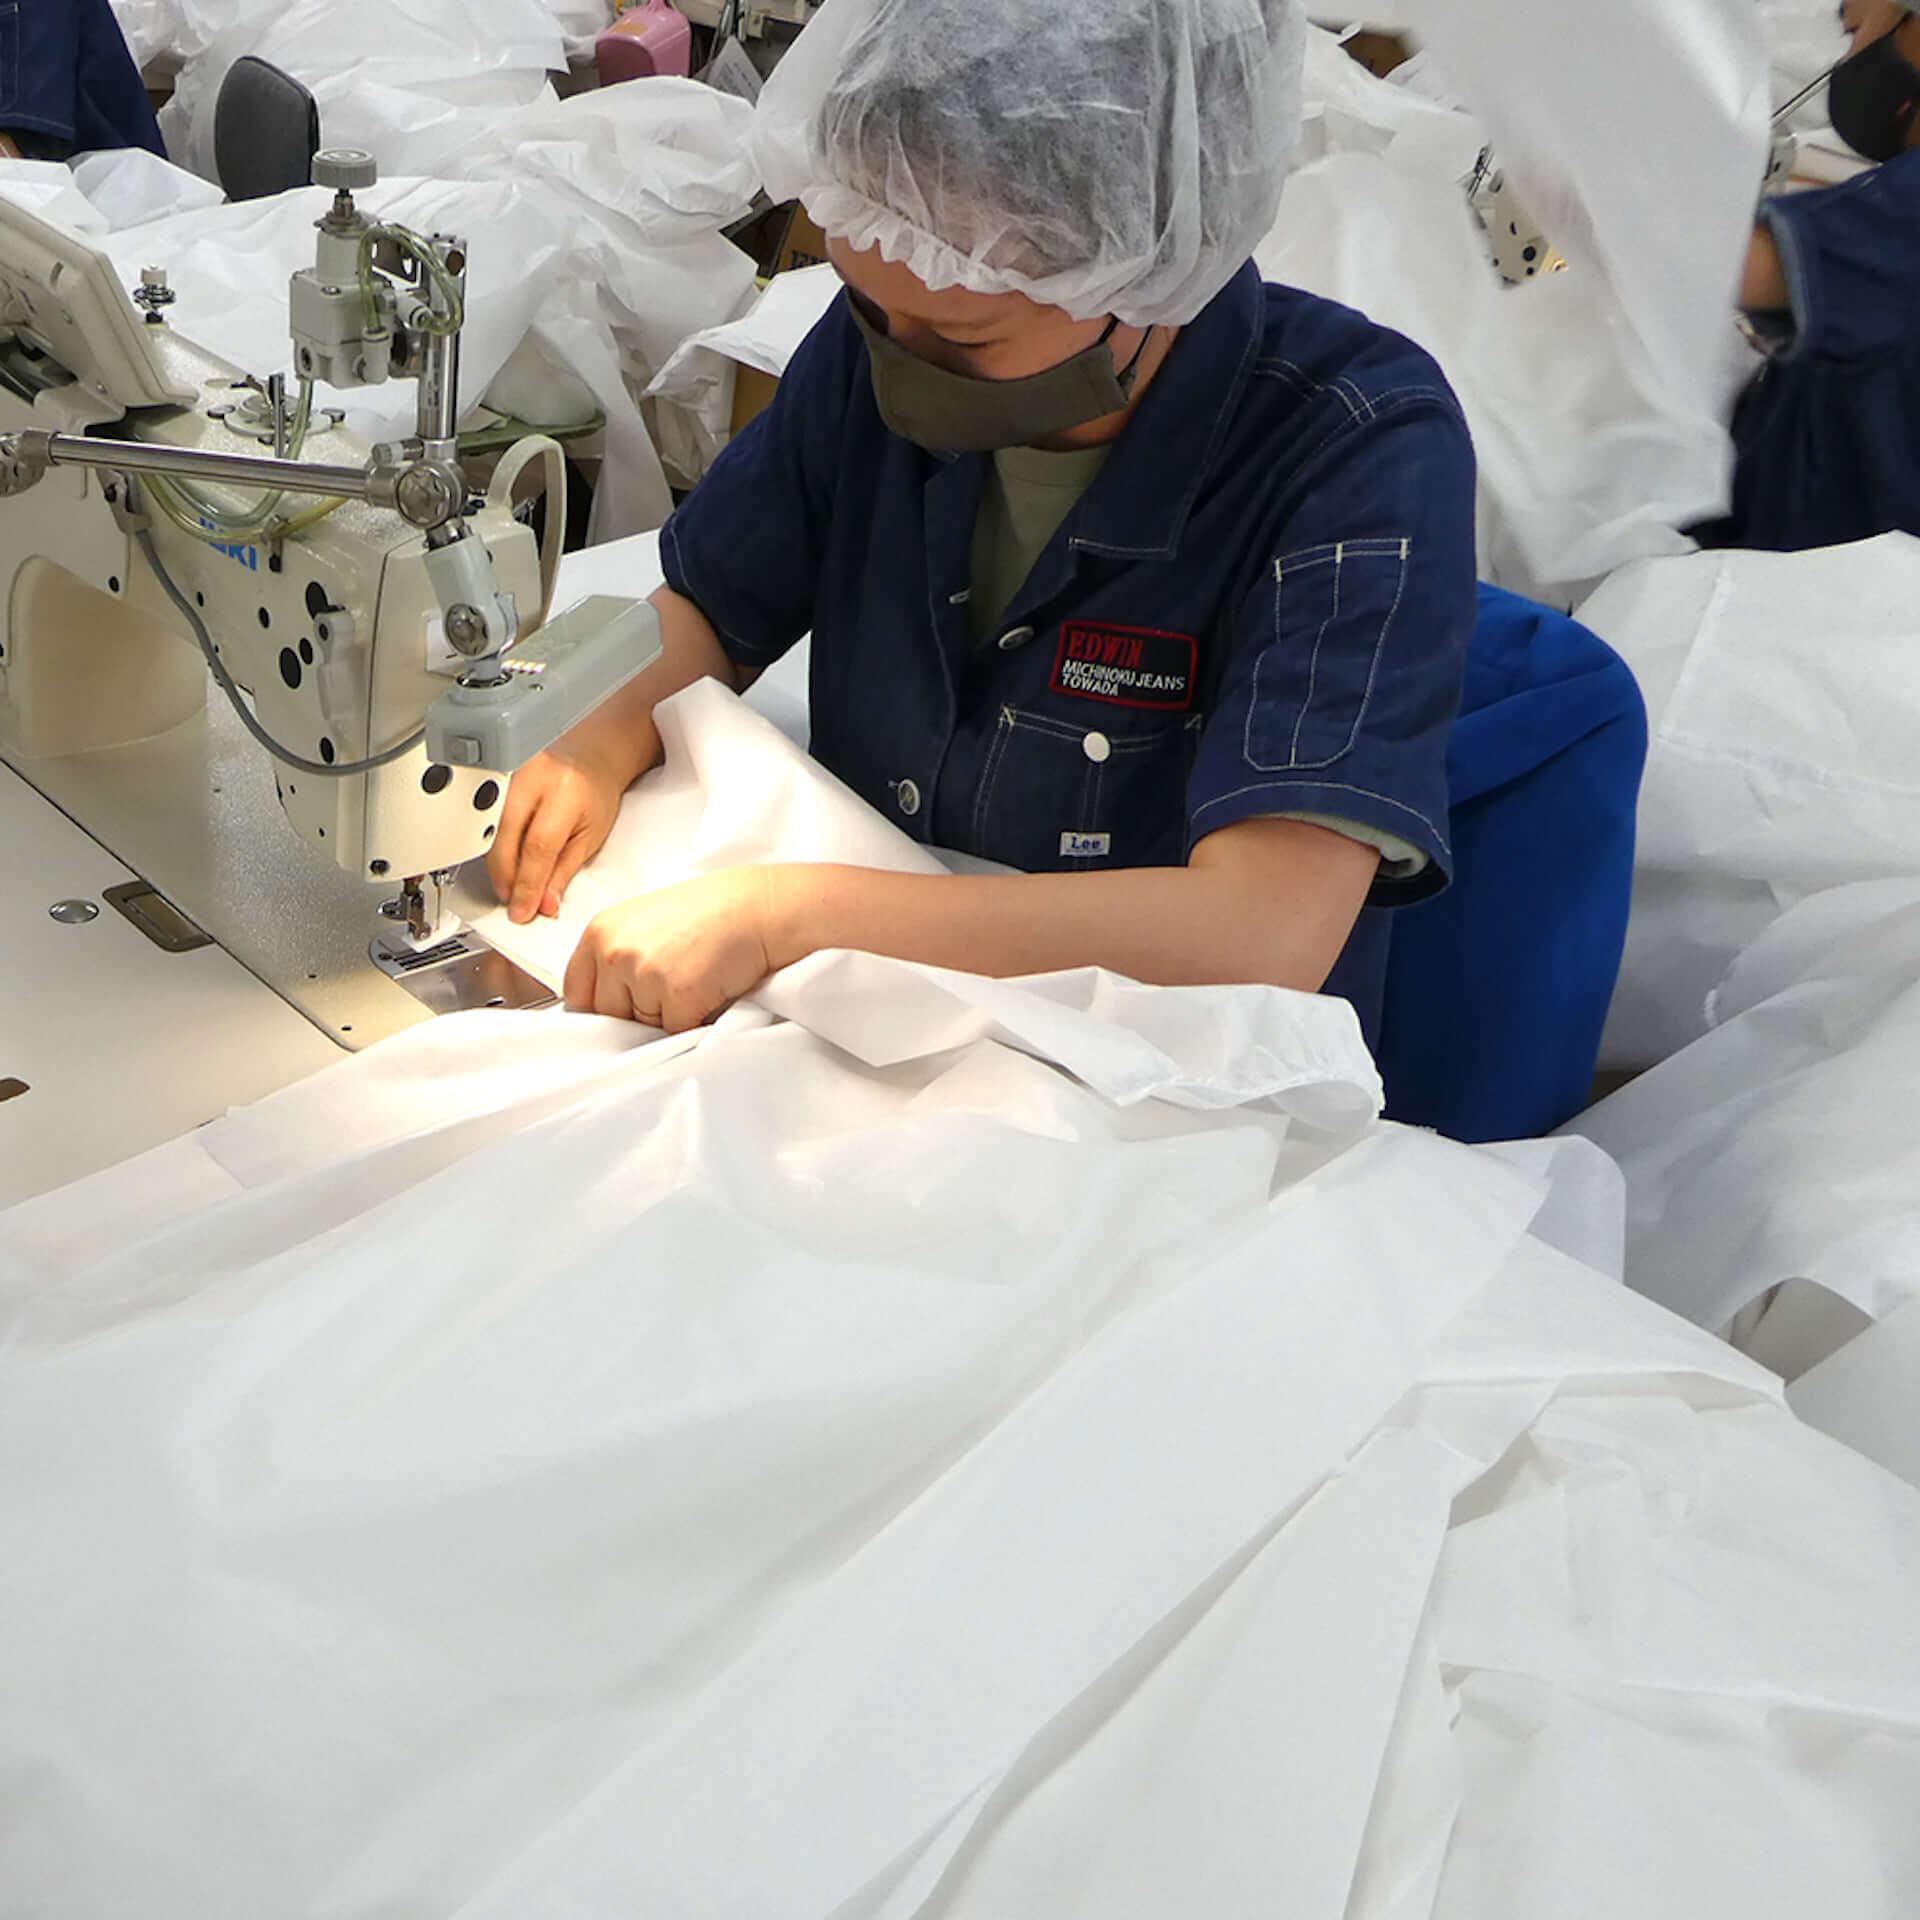 EDWINがアイソレーションガウンを自社縫製工場にて生産開始&オンライン販売もスタート! lf200722_edwin_7-1920x1920